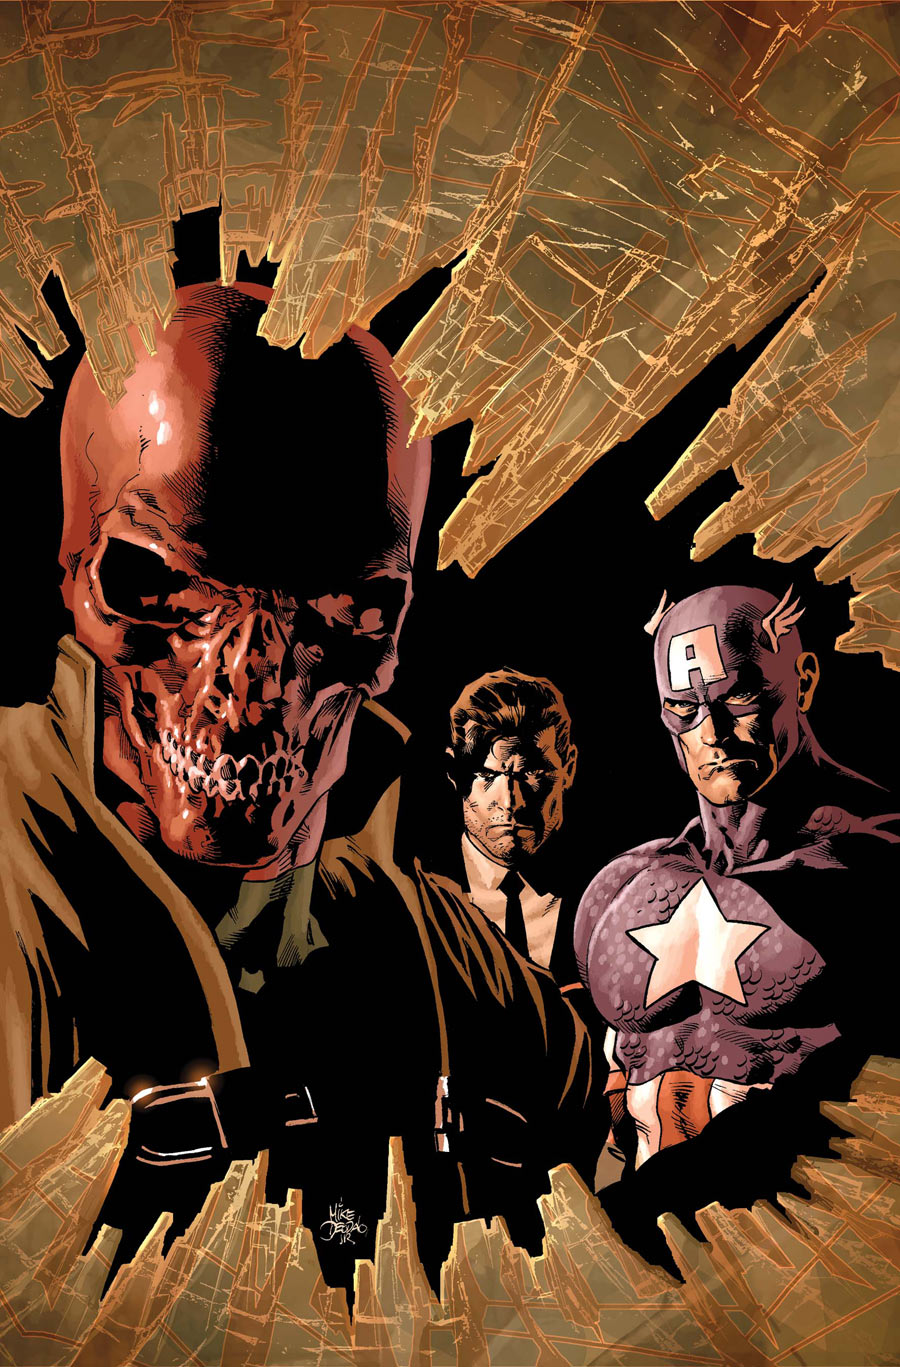 Avengers (1950s) (Earth-616)/Gallery